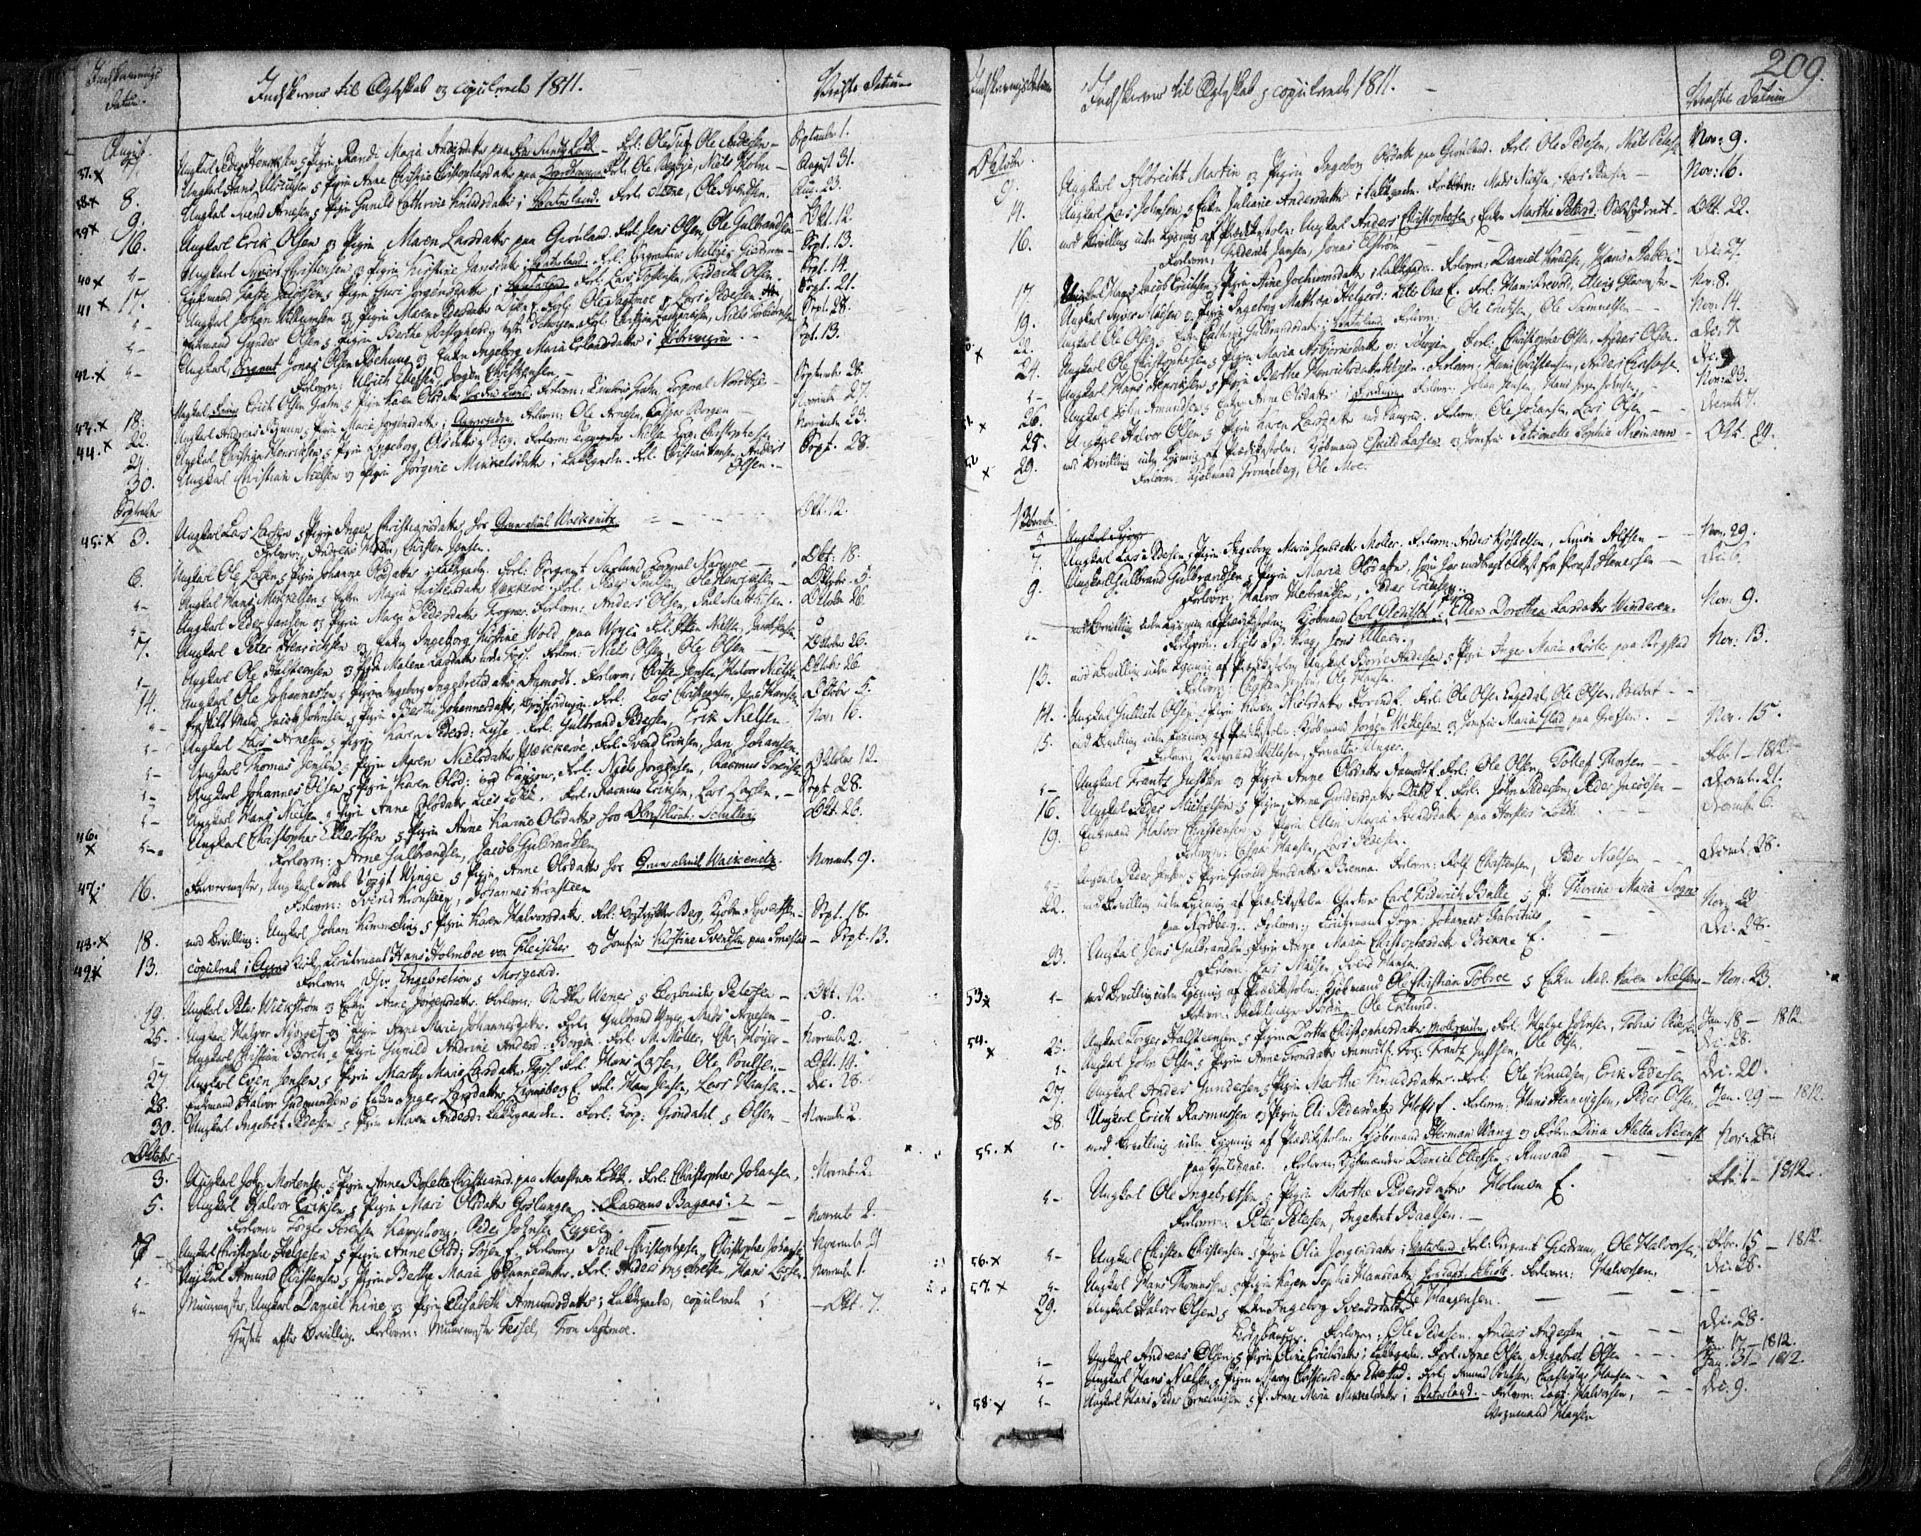 SAO, Aker prestekontor kirkebøker, F/L0011: Parish register (official) no. 11, 1810-1819, p. 209